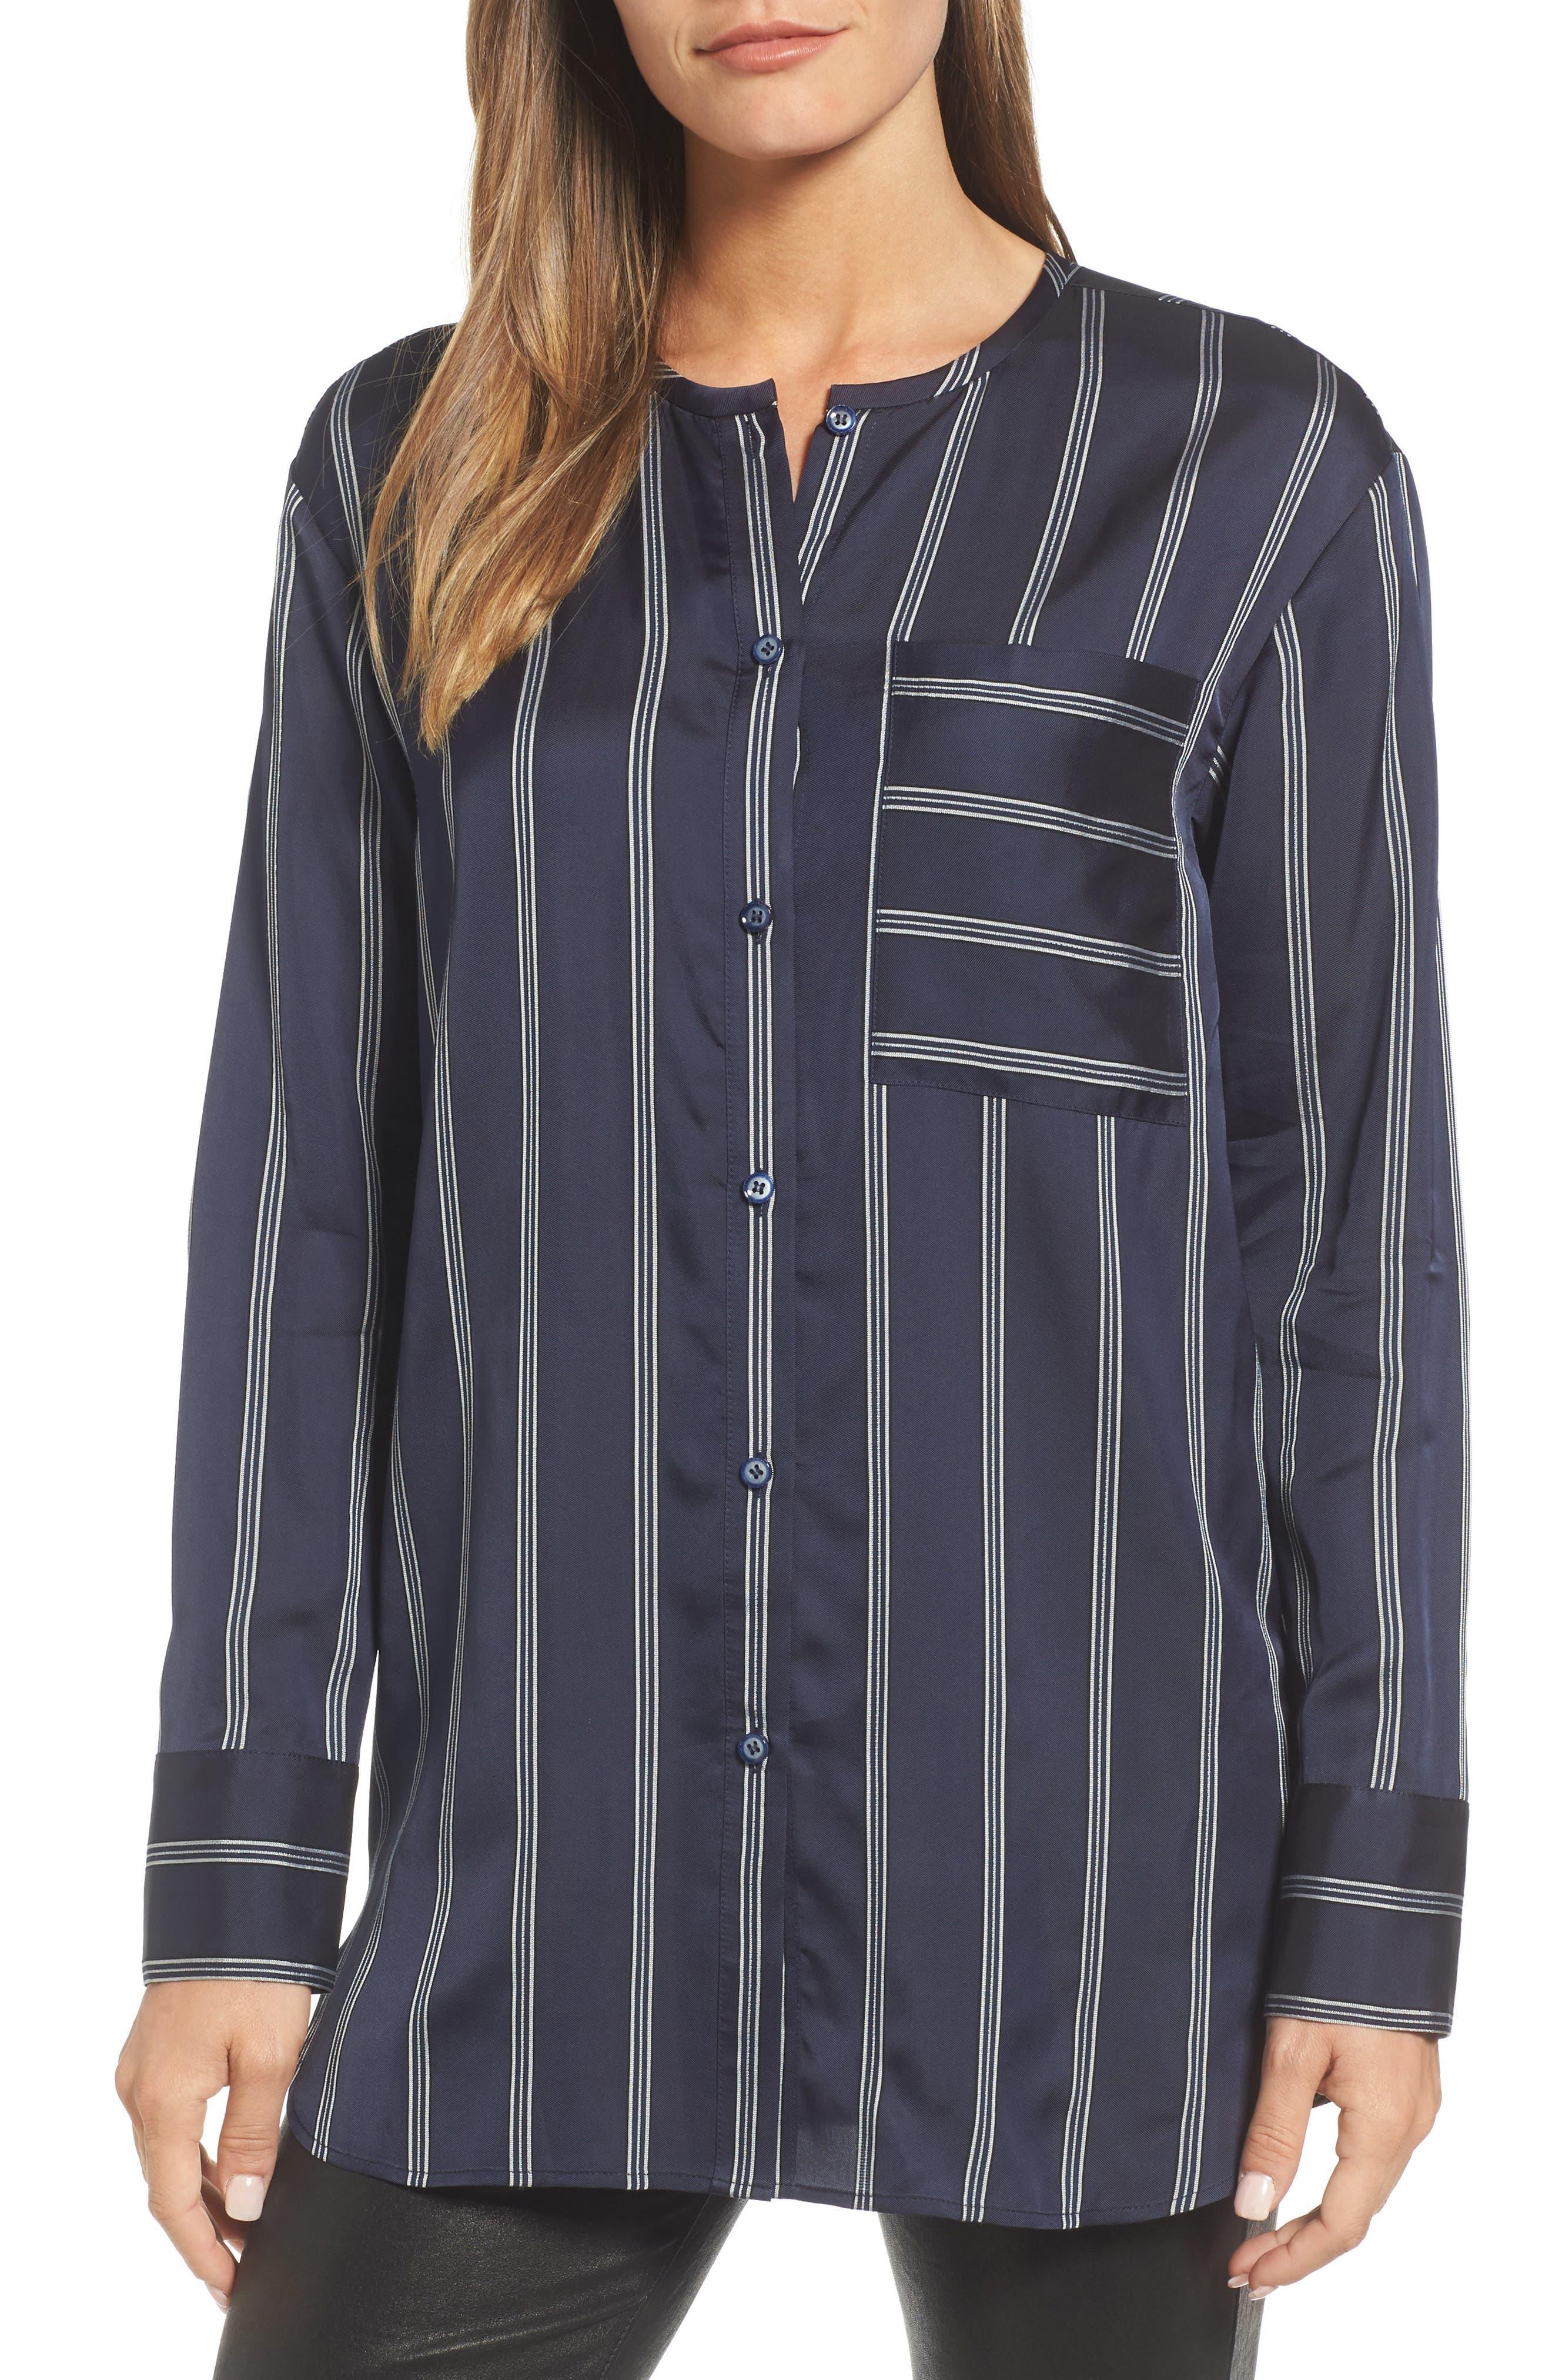 Nordstrom Signature Striped Patch Pocket Shirt